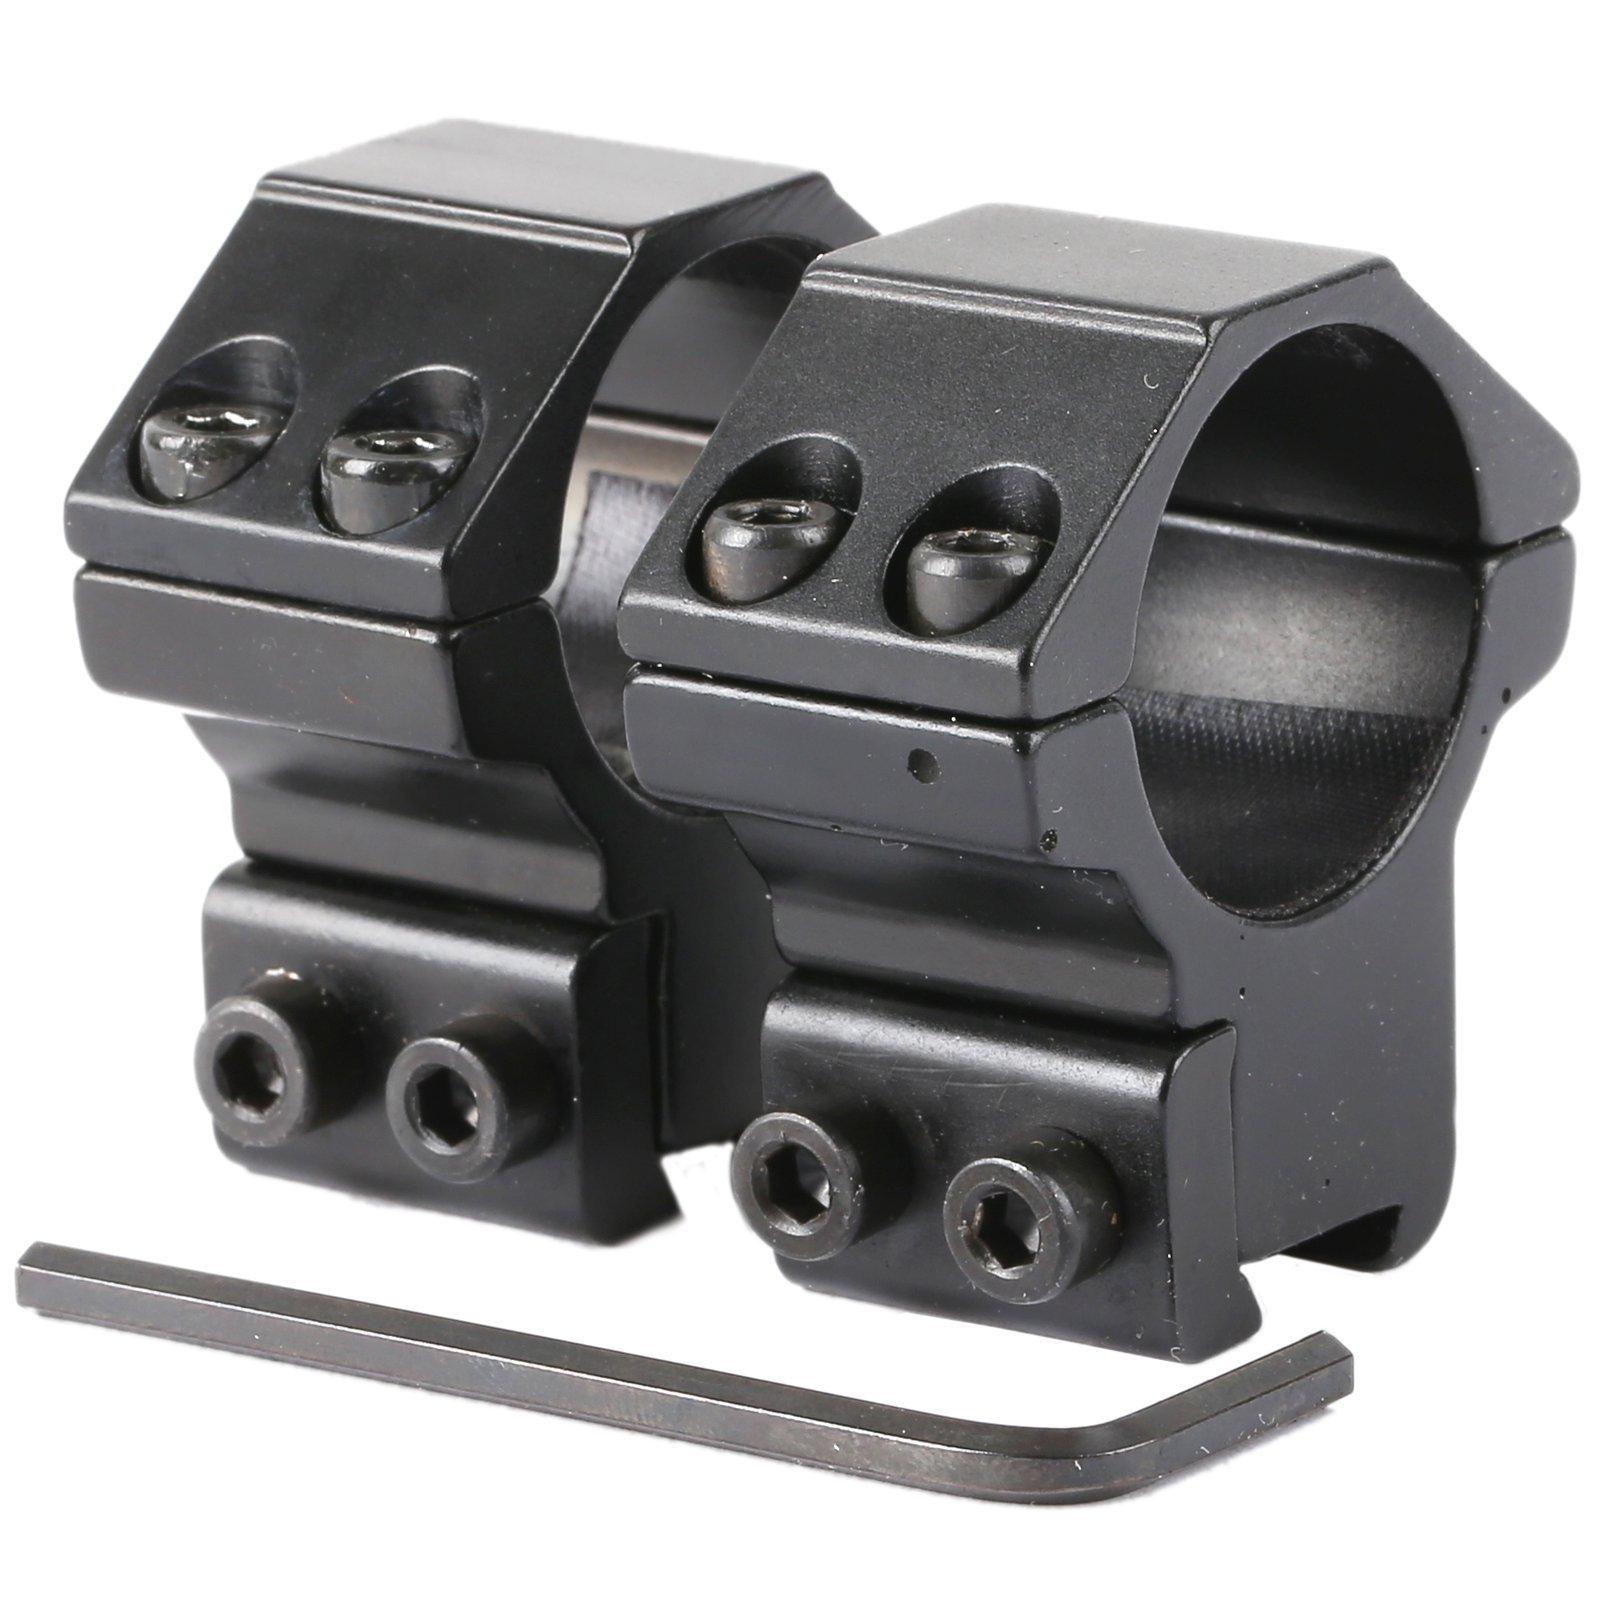 "Dophee 2Pcs Medium Profile 25.4mm/1"" Scope Rings Rifle 11mm Dovetail Weaver Rail Mount"